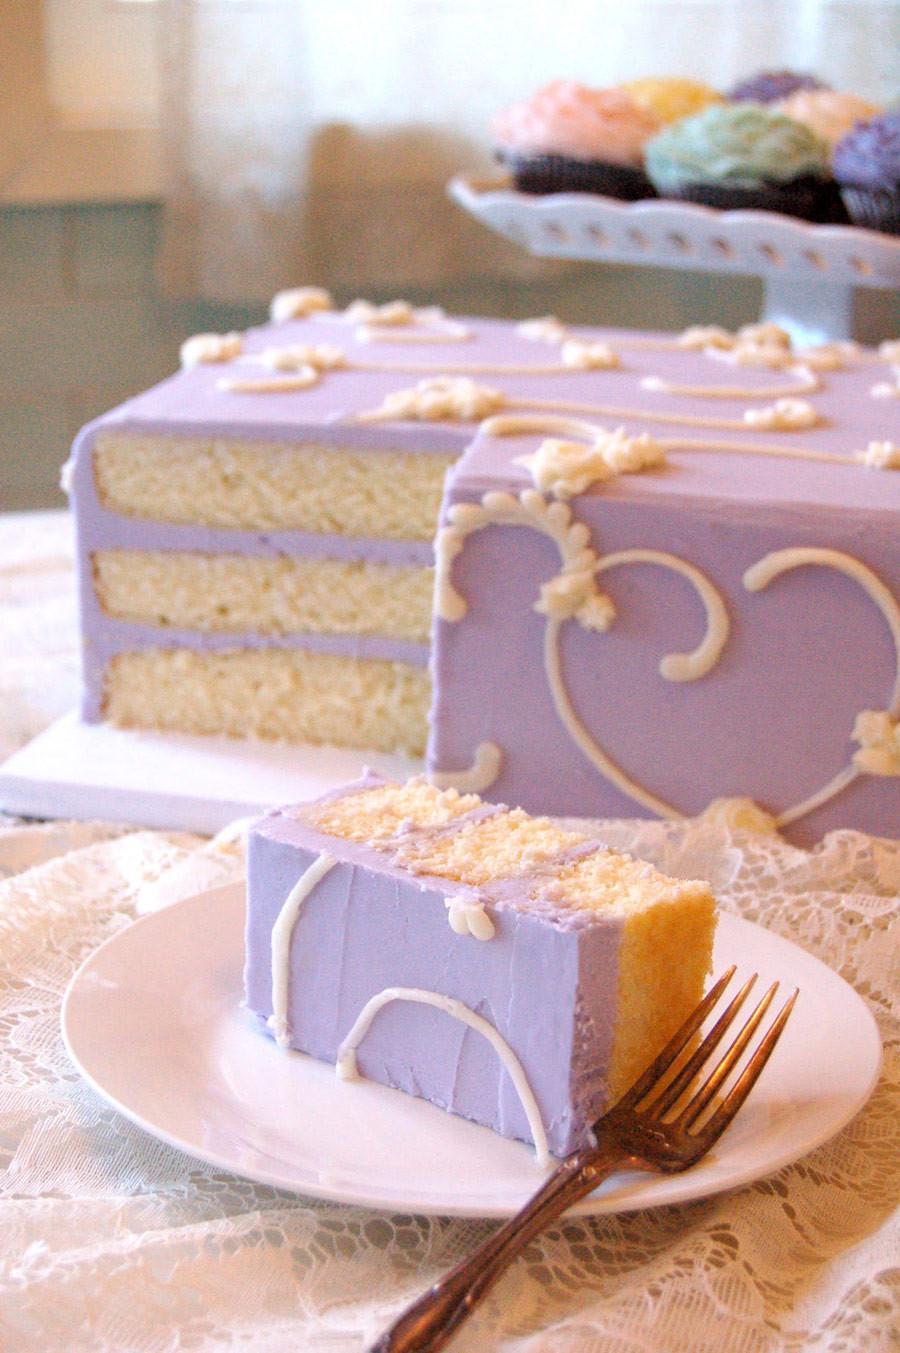 Magnolia Bakery Wedding Cakes  Sheet Cakes Magnolia Bakery